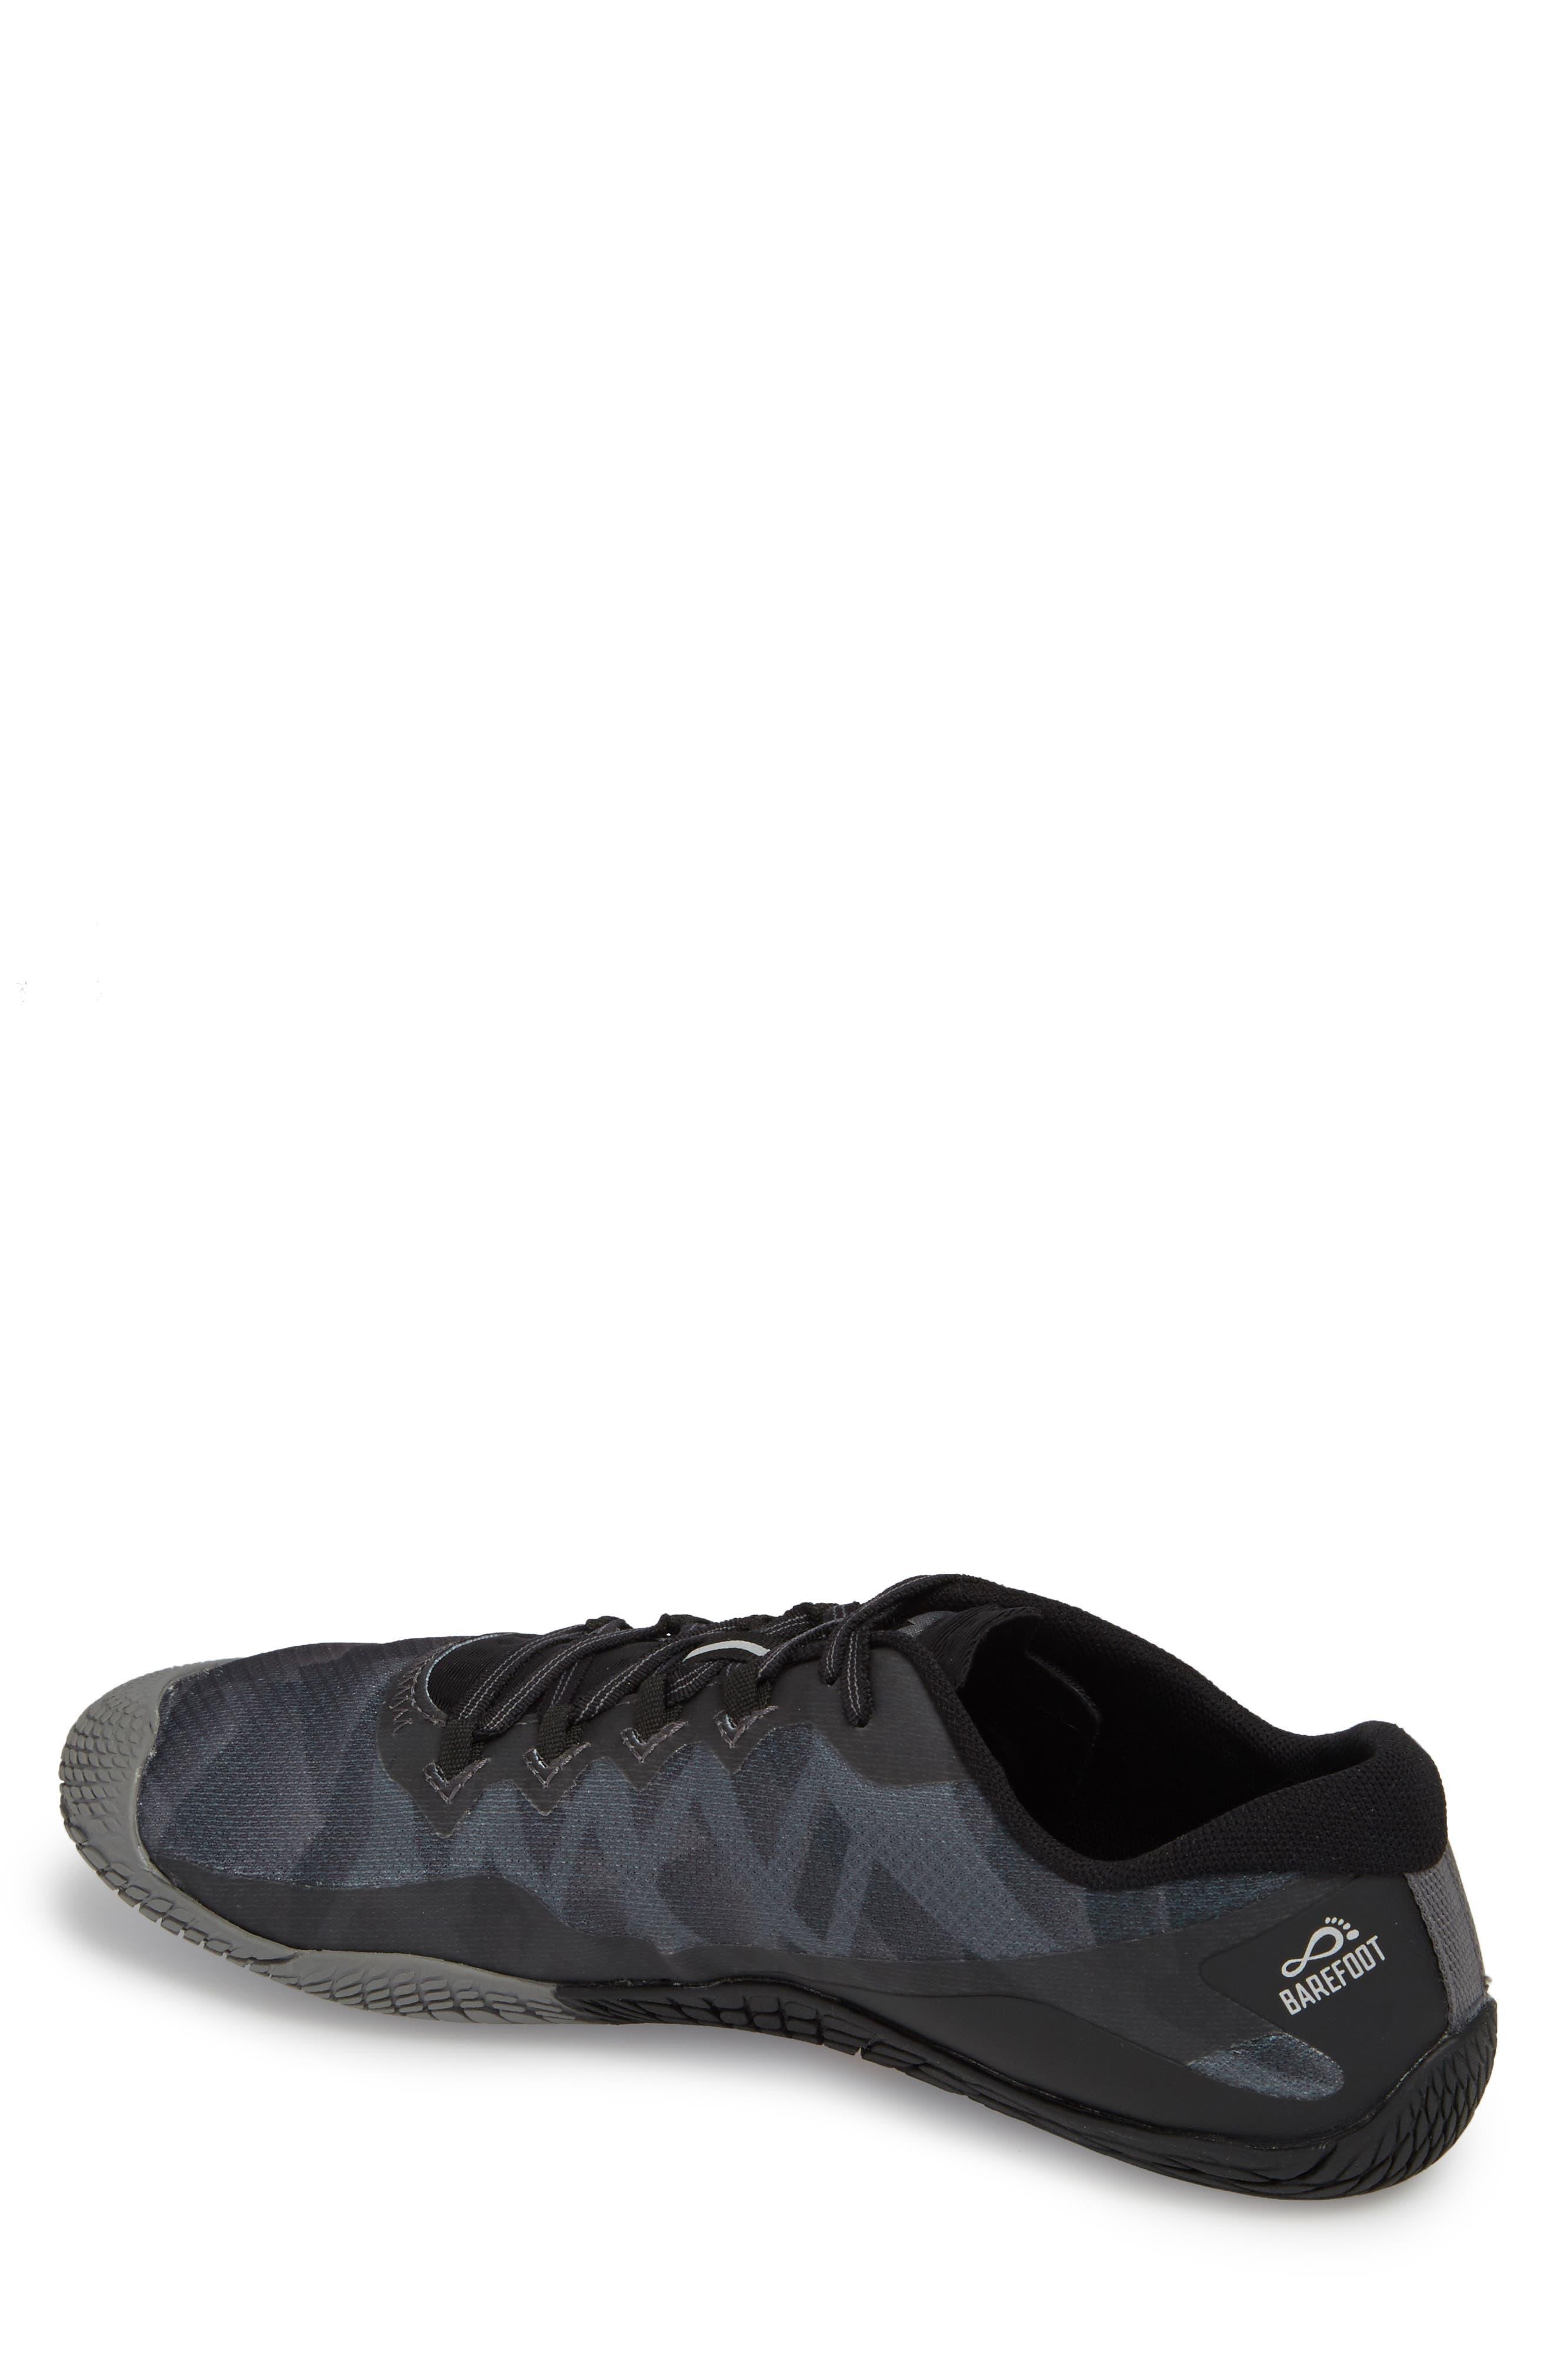 Vapor Glove 3 Trail Running Shoe,                             Alternate thumbnail 2, color,                             BLACK/ SILVER